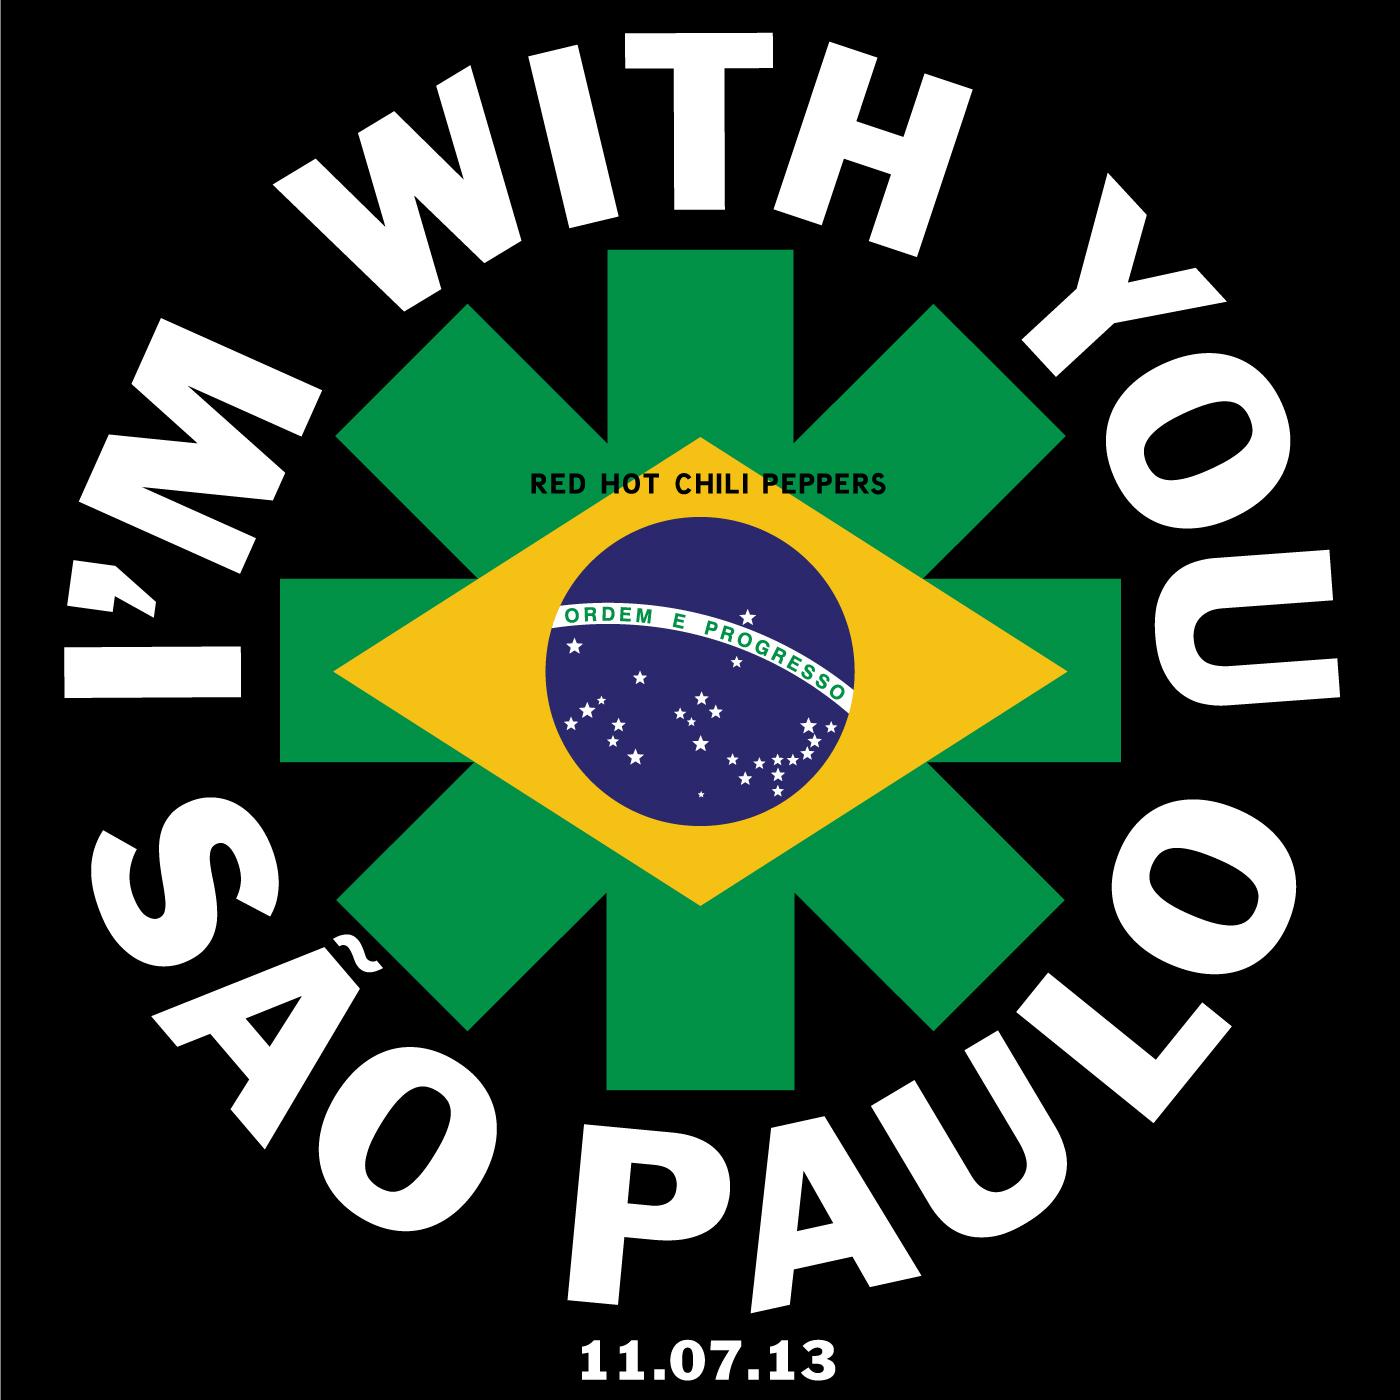 Telecharger Red Hot Chili Peppers - Circuito Banco do Brasil Festival - Rio de Janeiro [MP3]